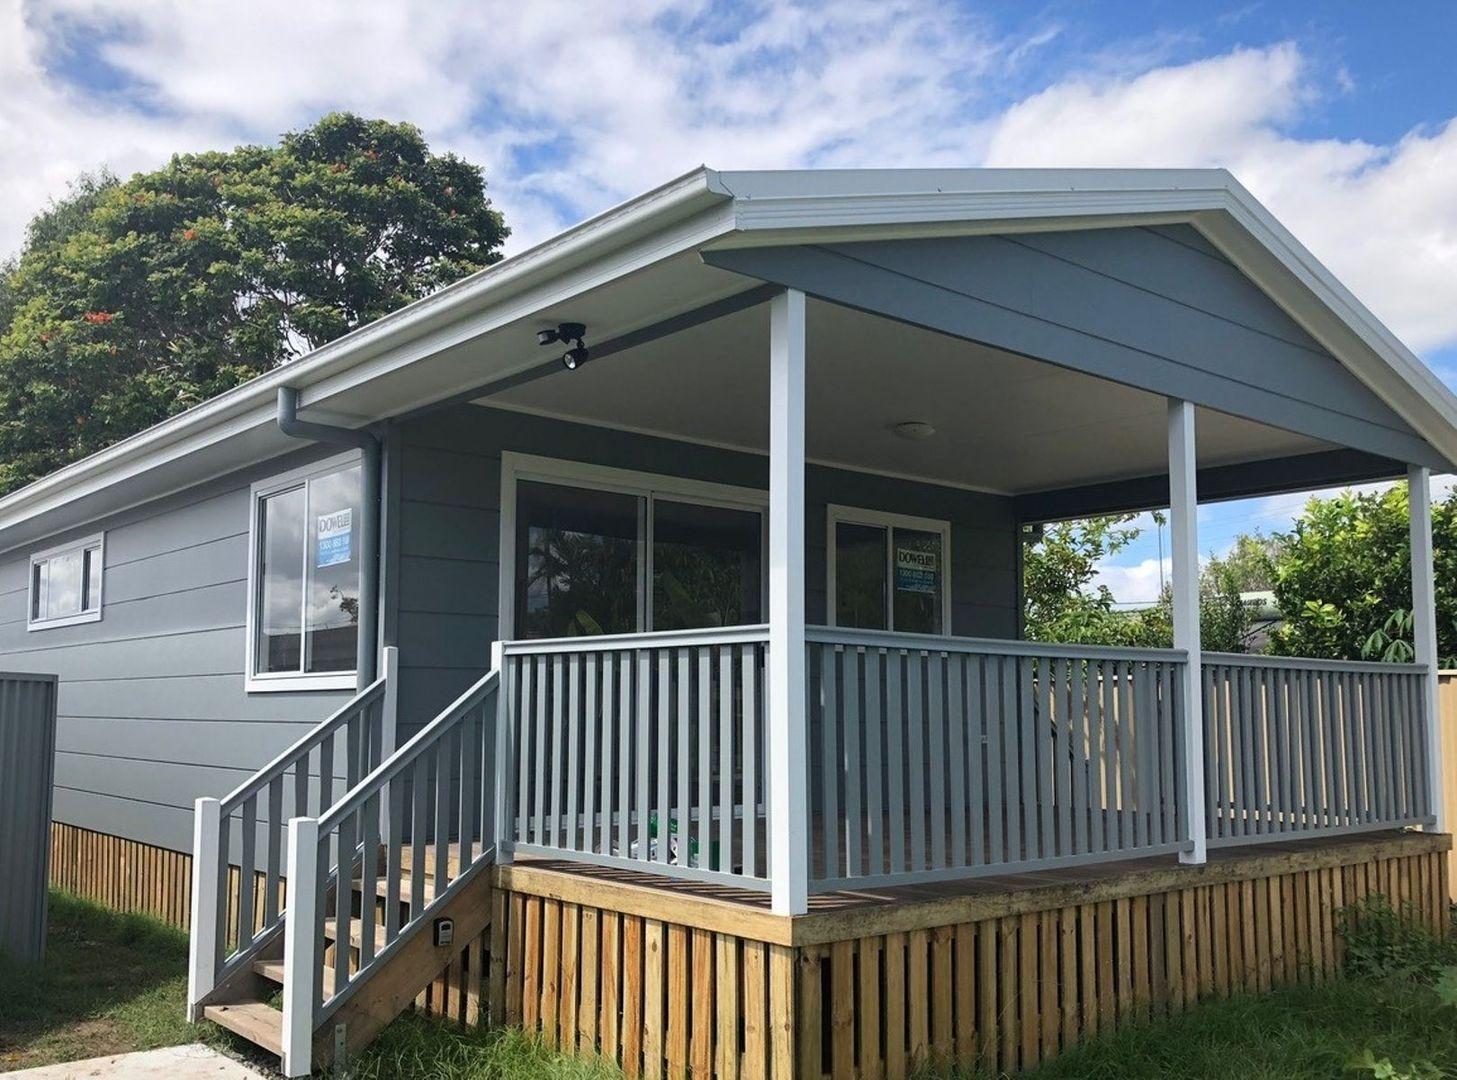 1a Allspice Street, Crestmead QLD 4132, Image 0